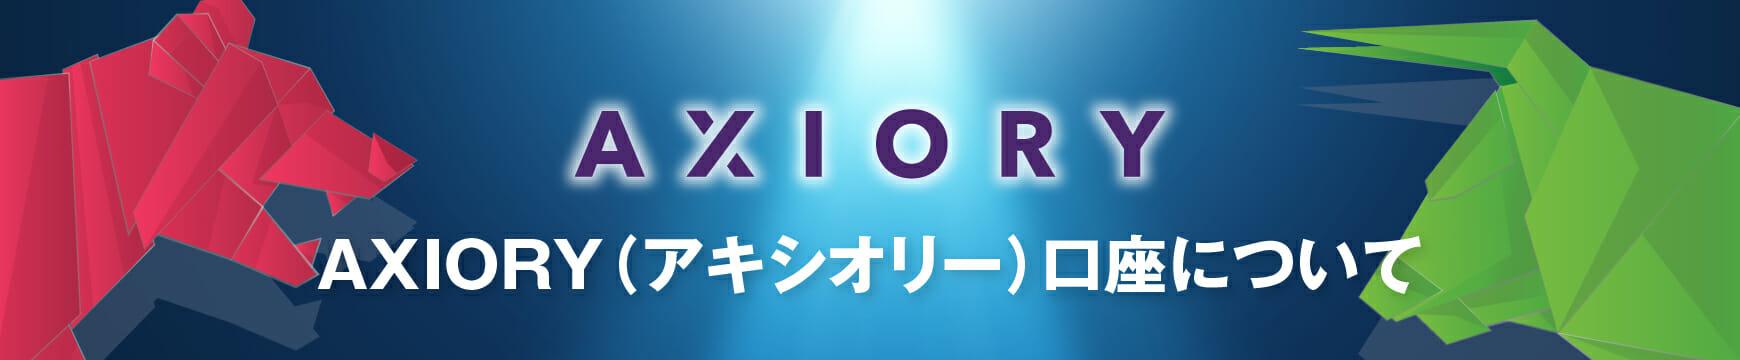 AXIORYの口座開設はありかなしか?日本語で徹底解説!